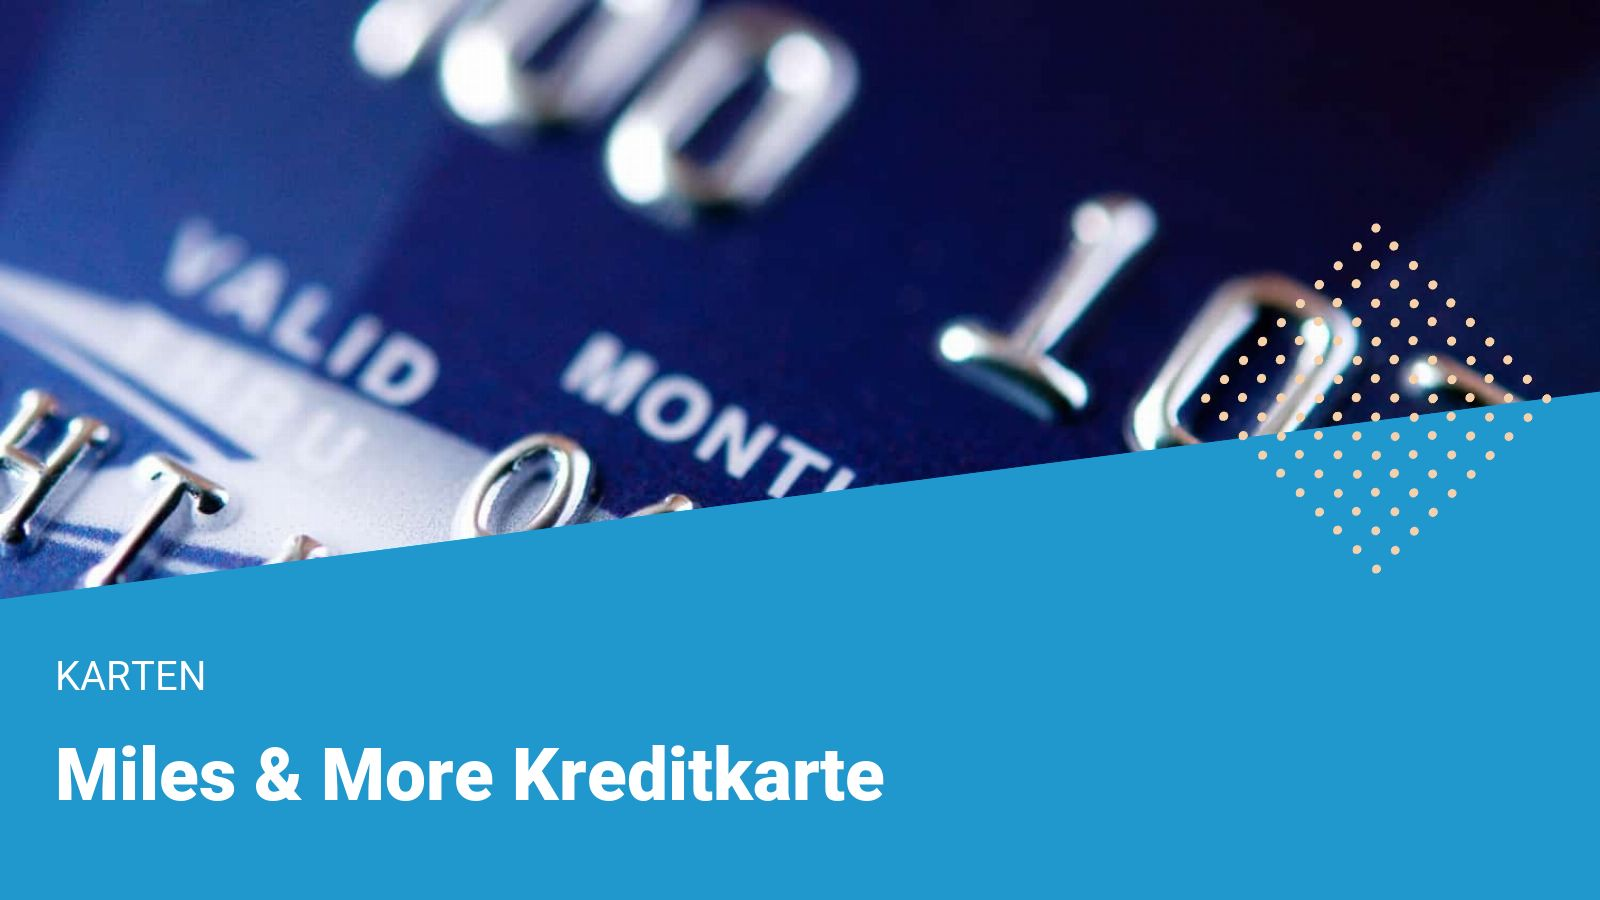 miles and more kreditkarte